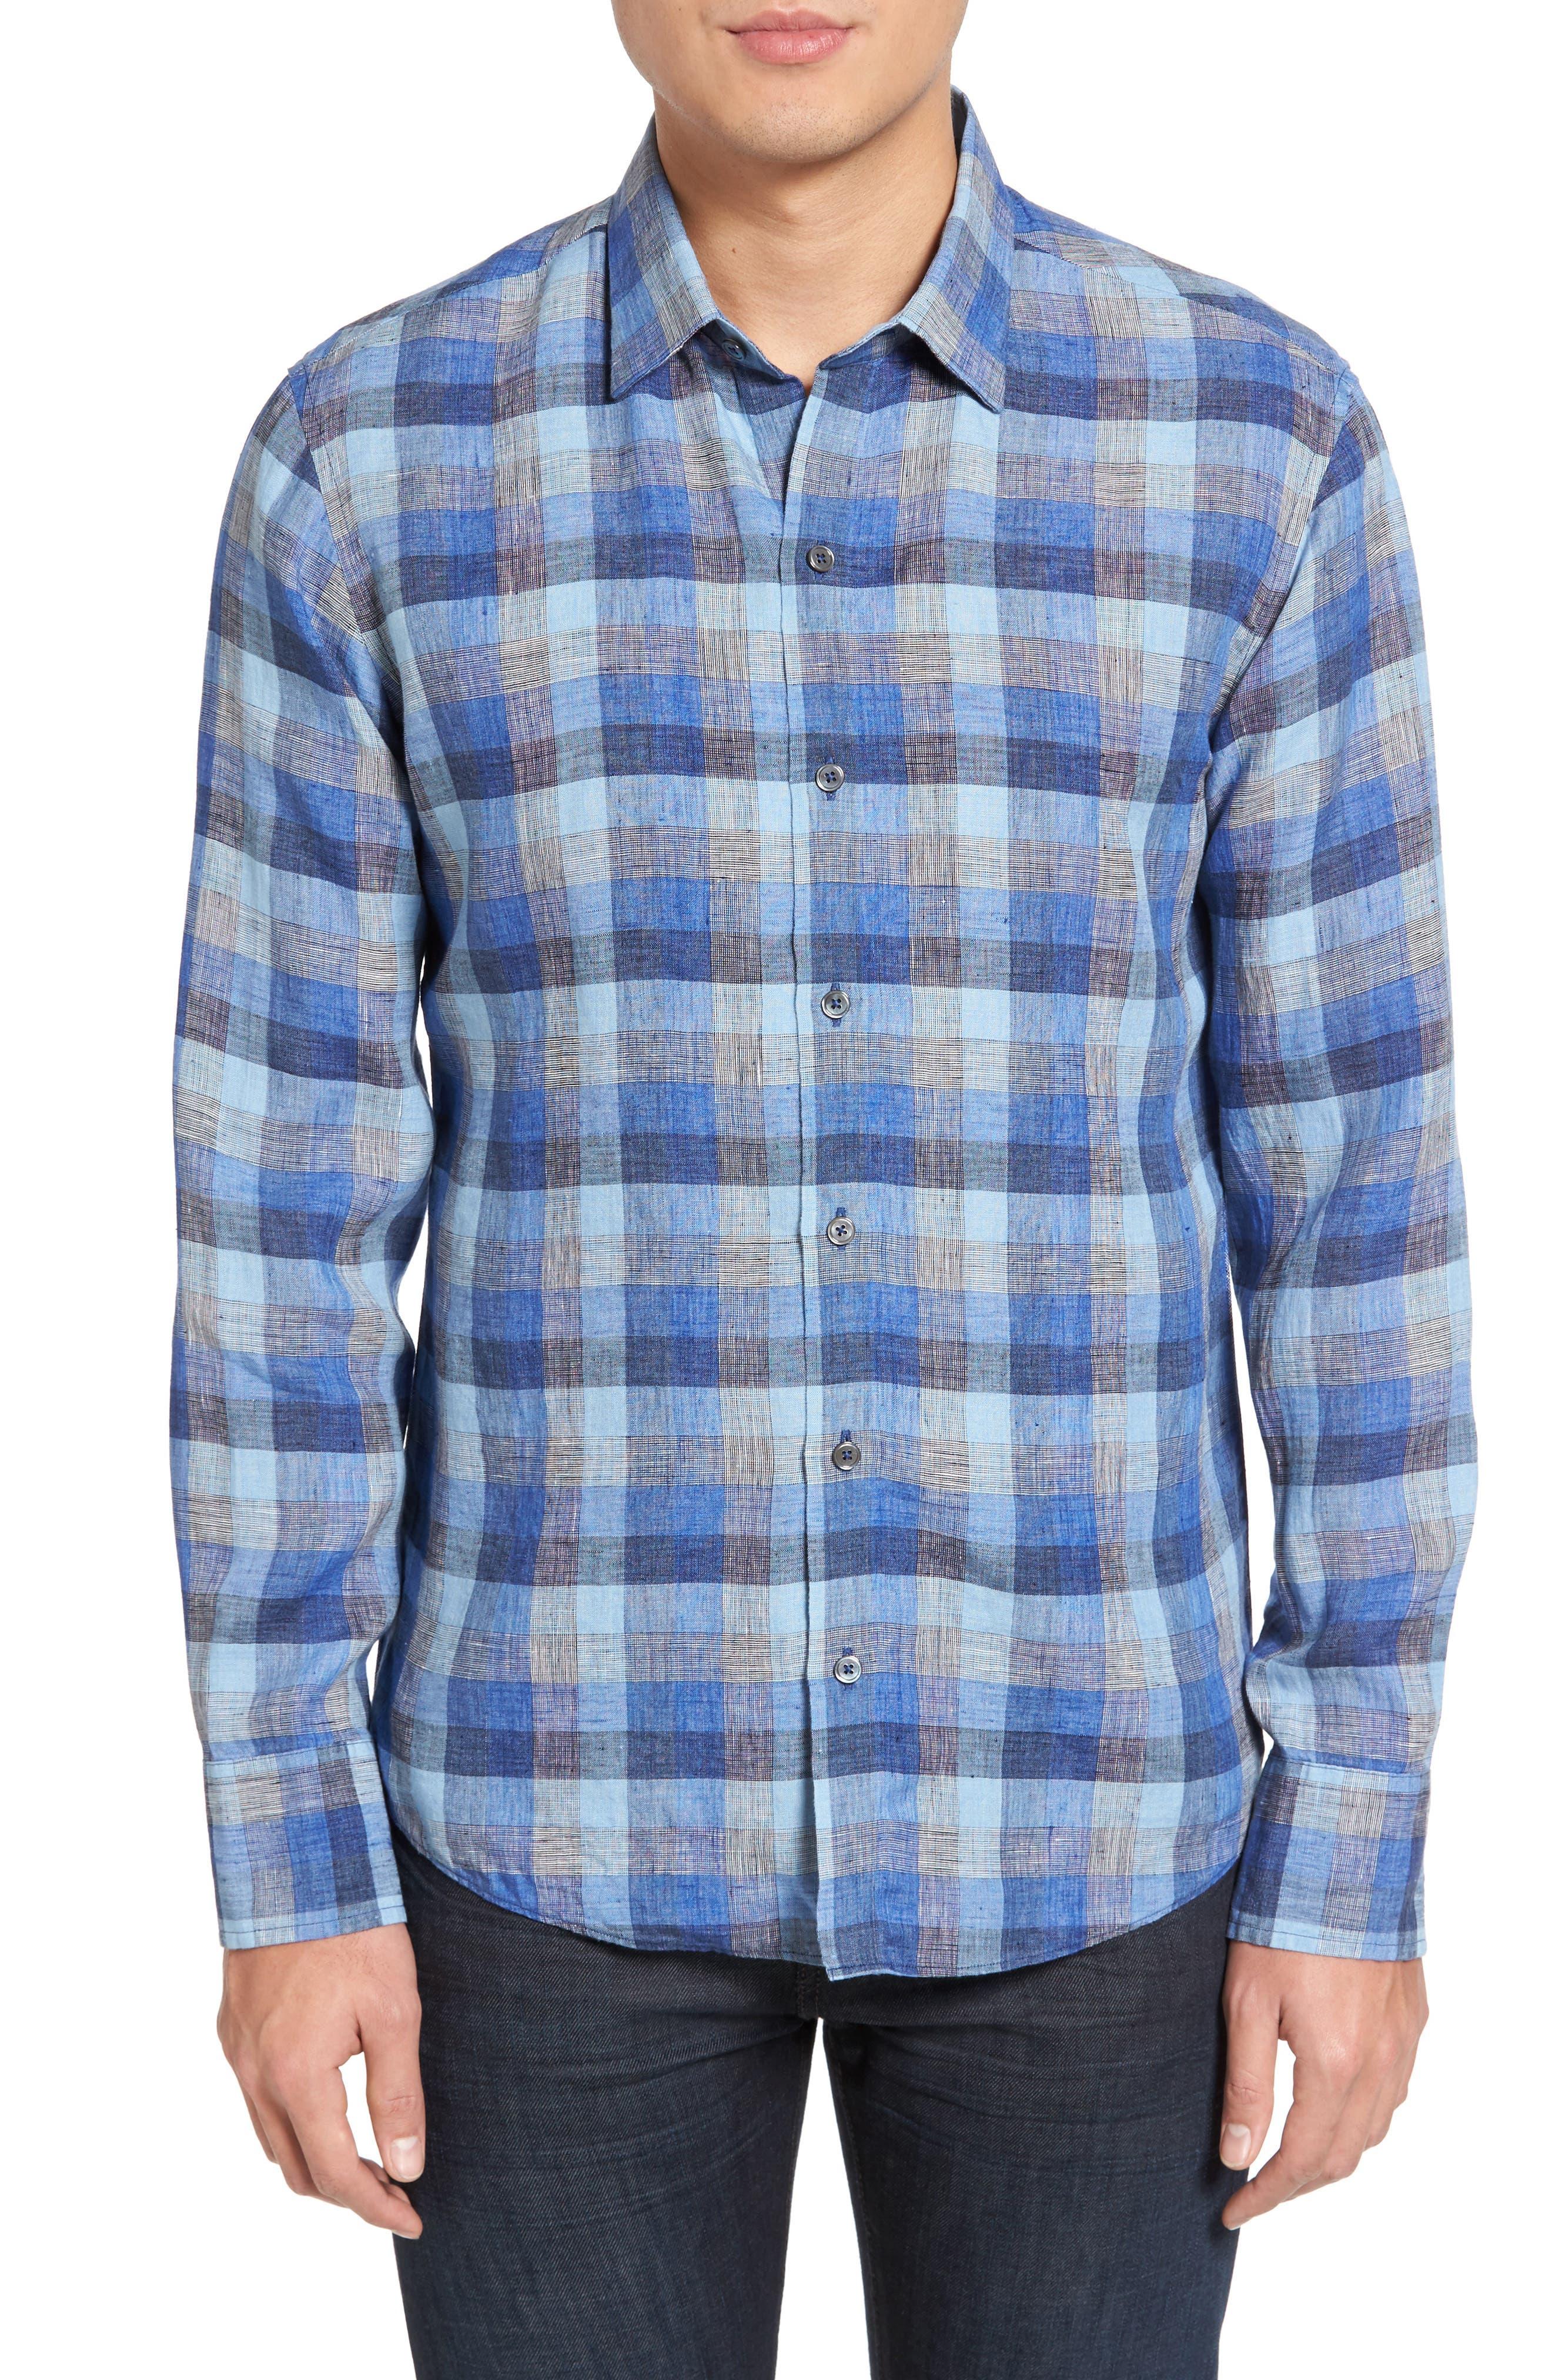 Alternate Image 1 Selected - Zachary Prell Kerner Plaid Sport Shirt